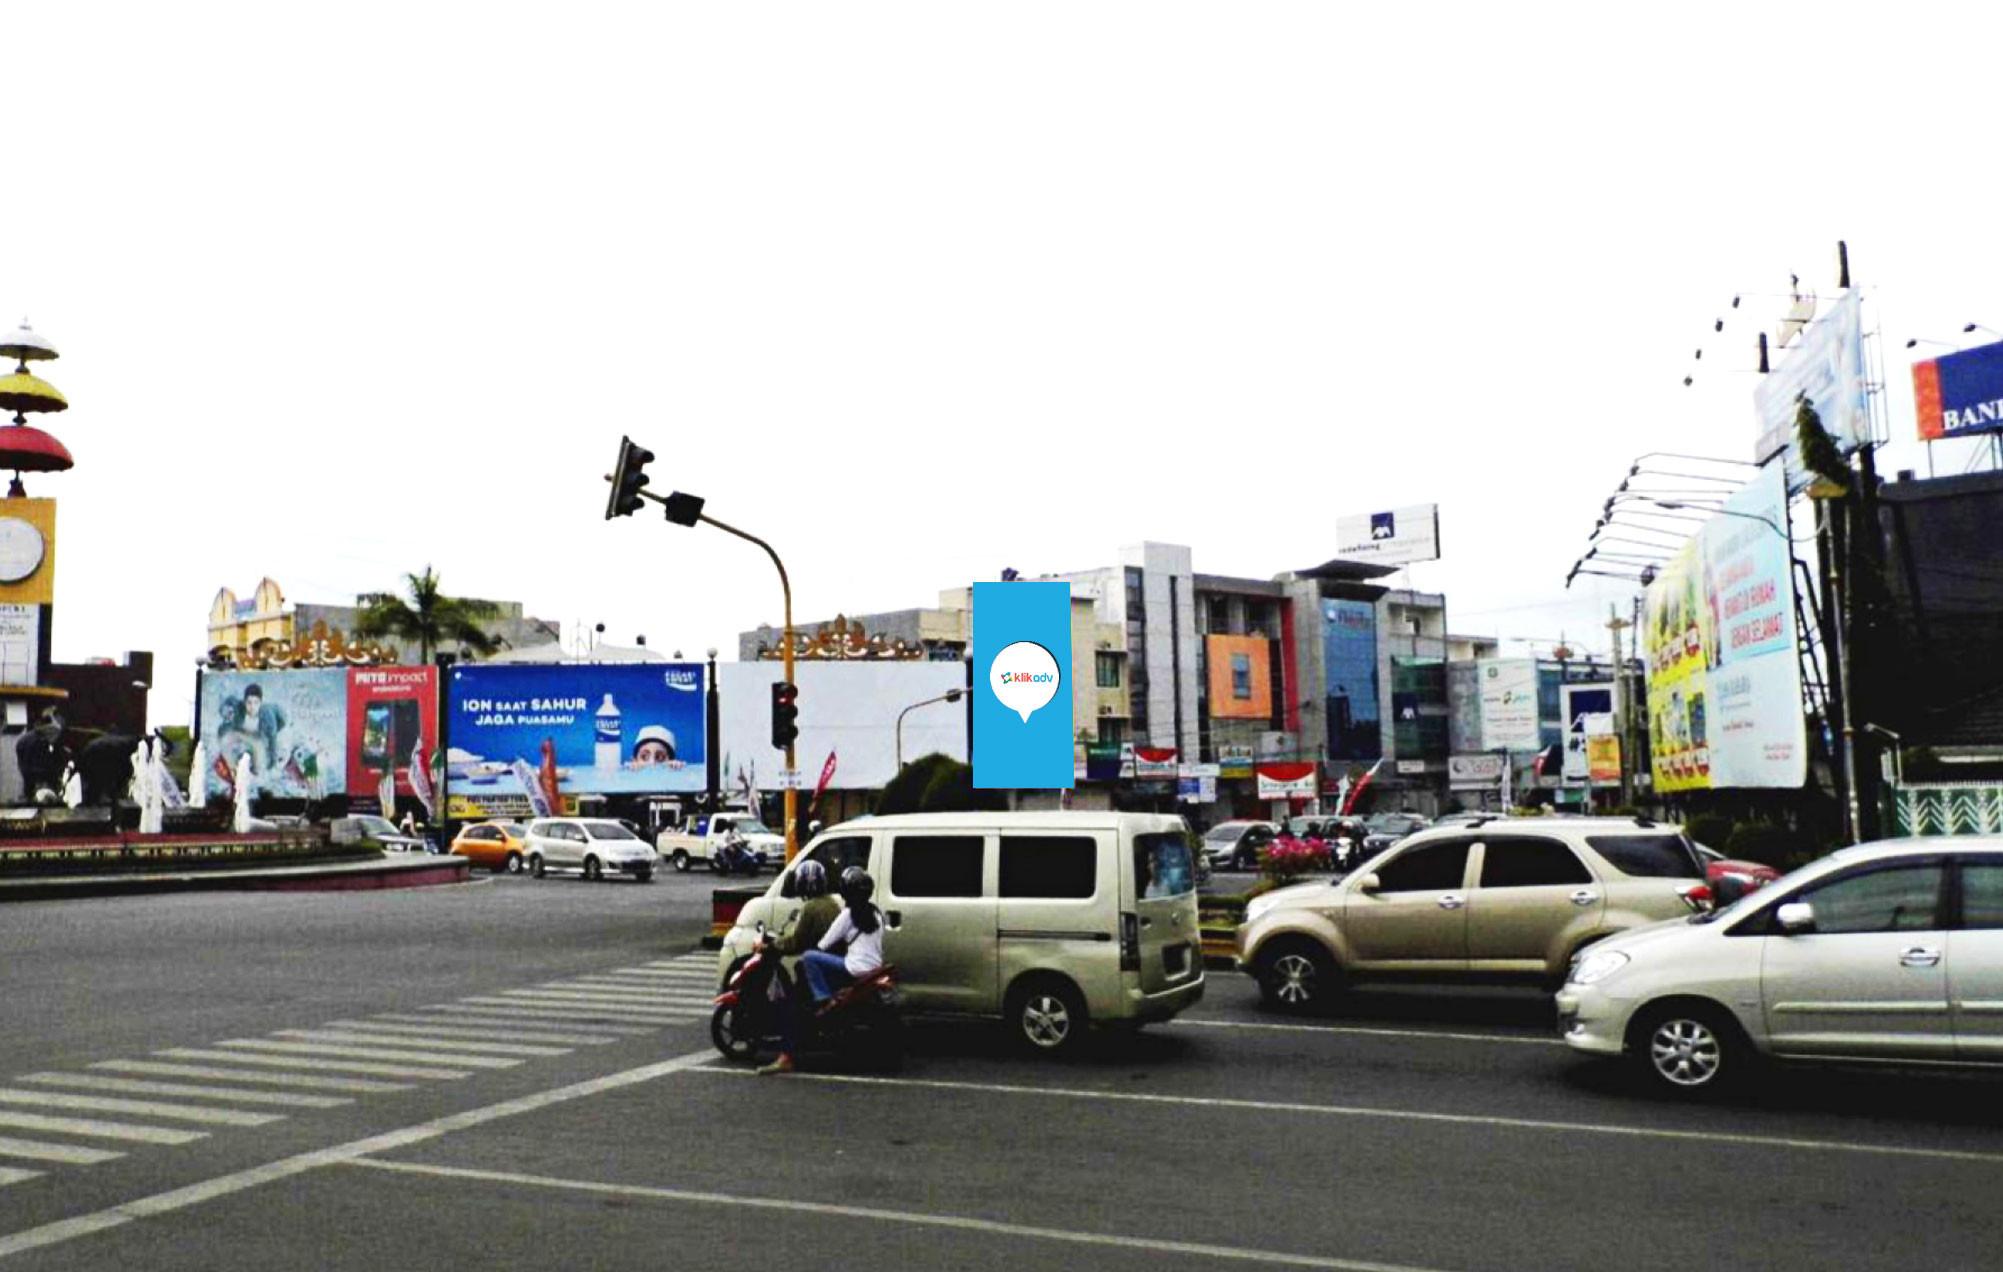 Sewa Billboard Lampung Kota Bandar Jl Raden Intan Bb Bundara